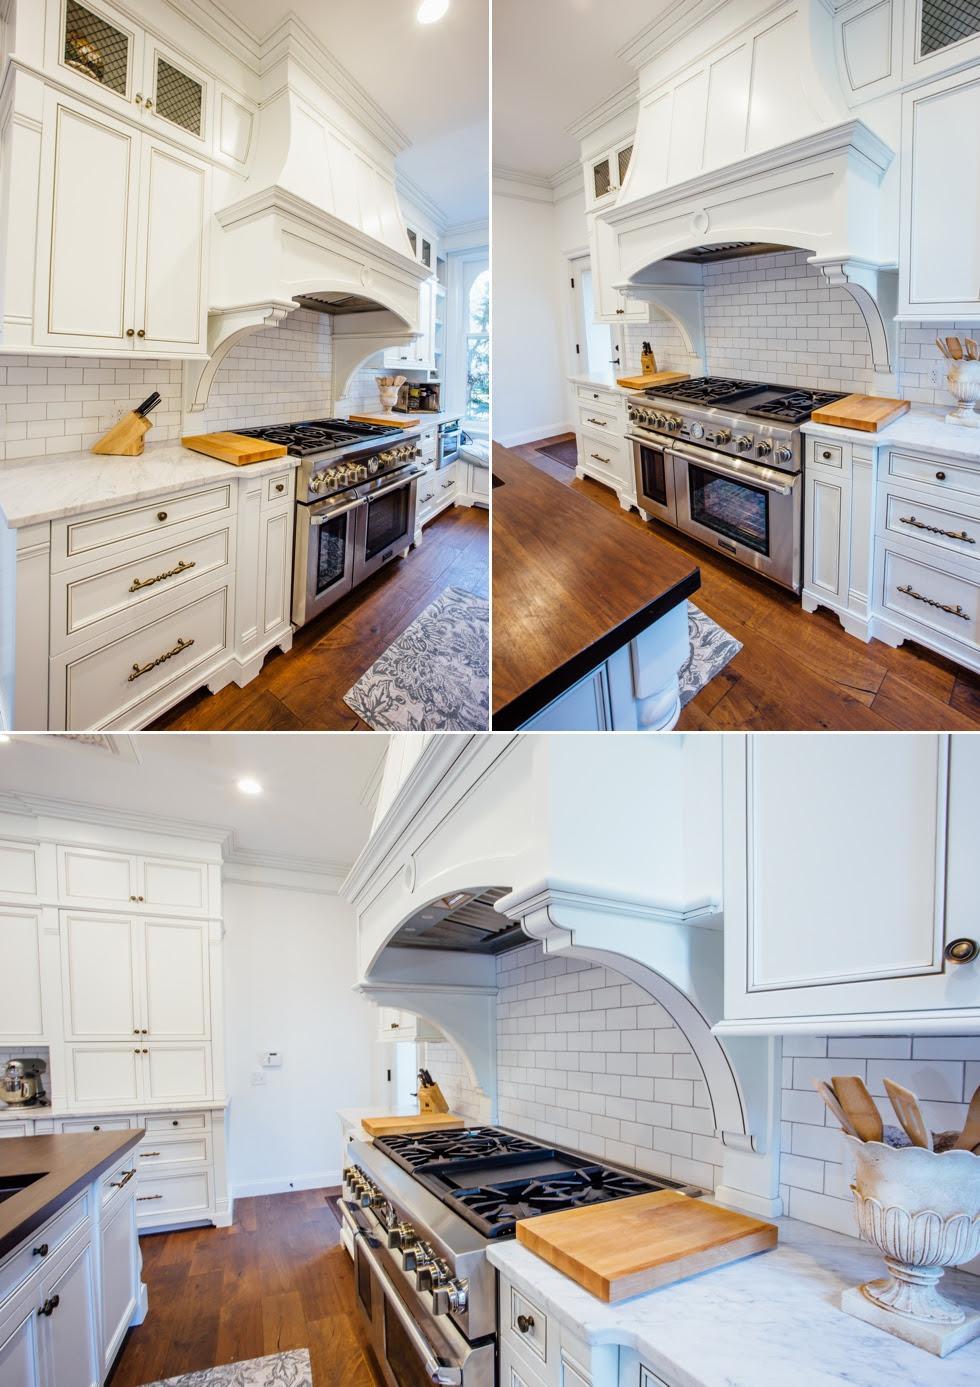 White Glazed Kitchen With Walnut Countertop